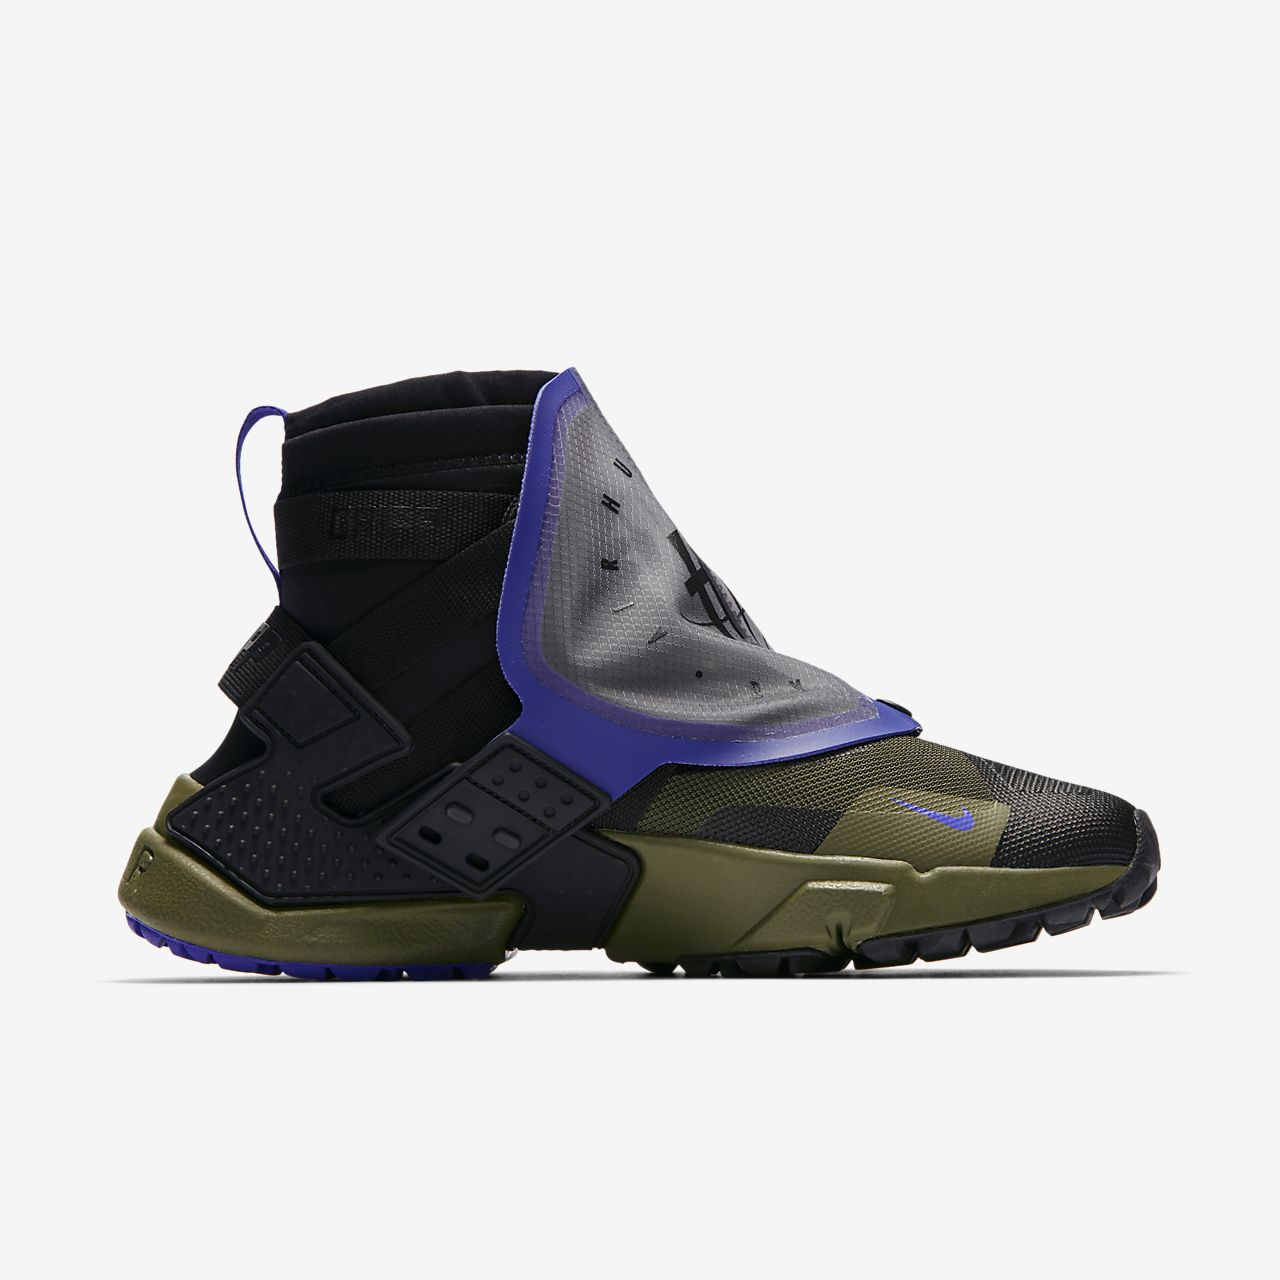 2202bbcd421c3 Nike Air Huarache Gripp Men's Shoe. Nike.com